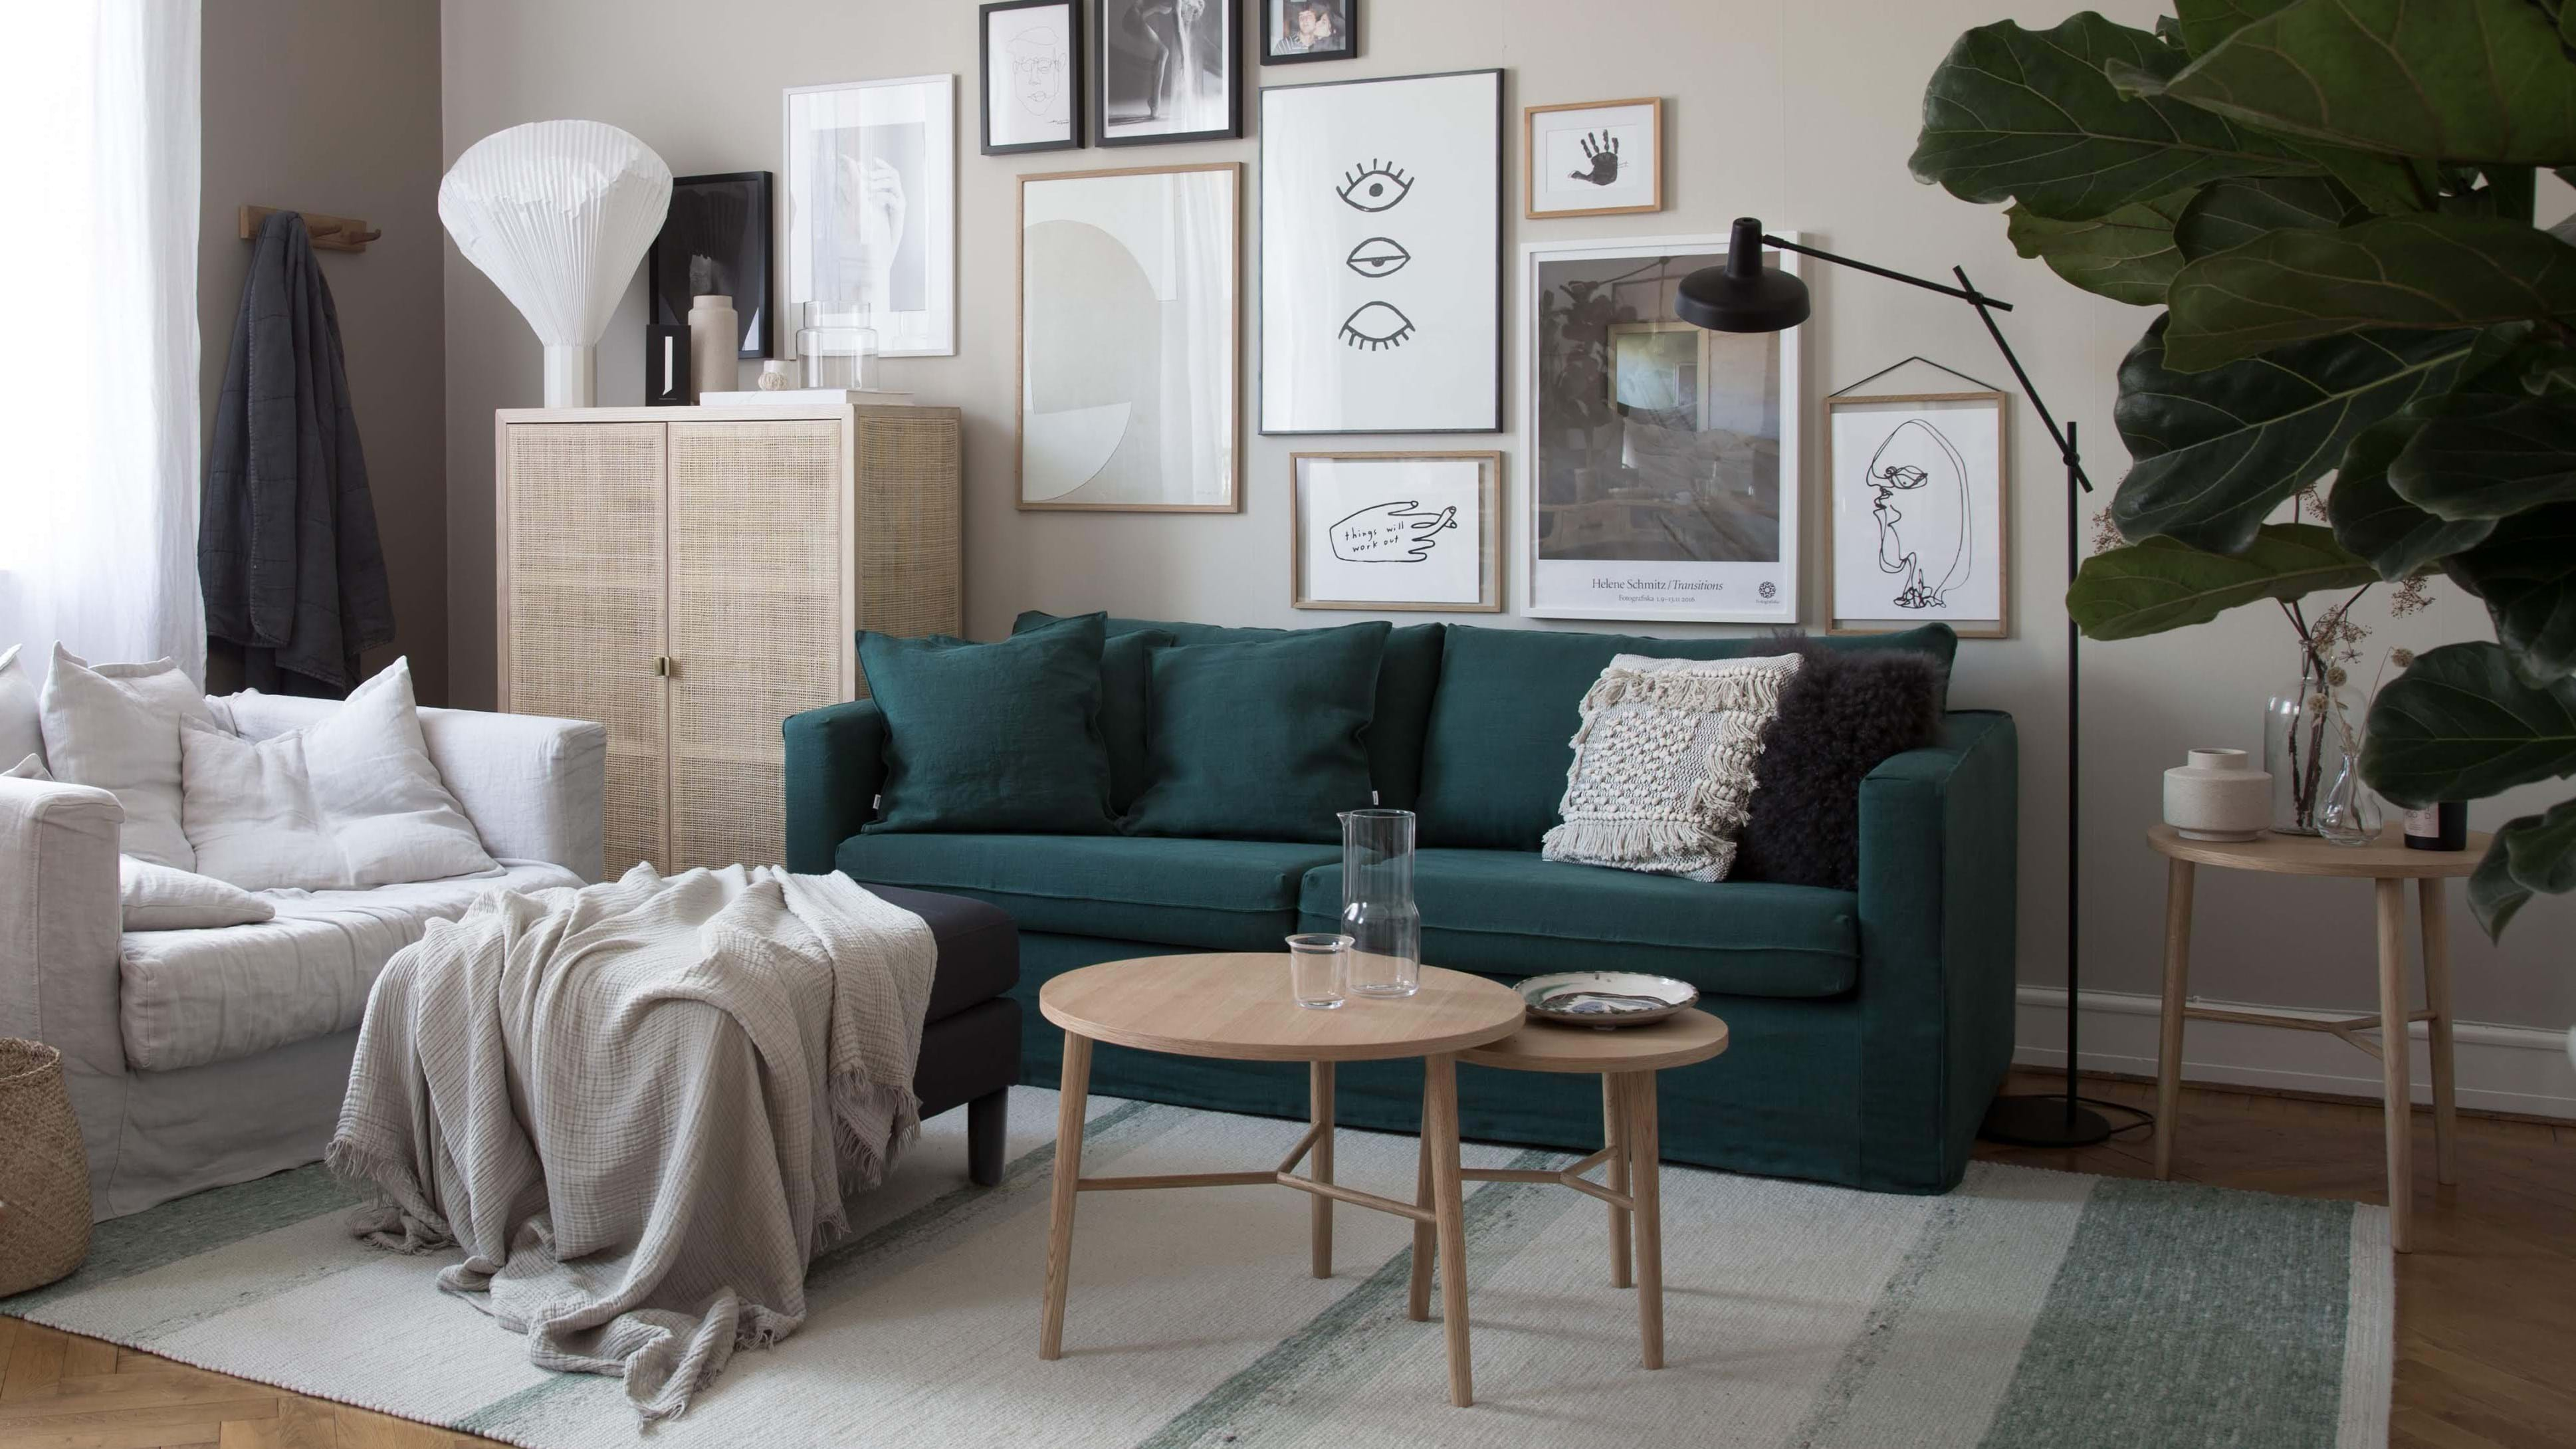 Divano In Rattan Ikea.My Scandinavian Home S Ikea Karlstad Sofa Style Makeover Bemz